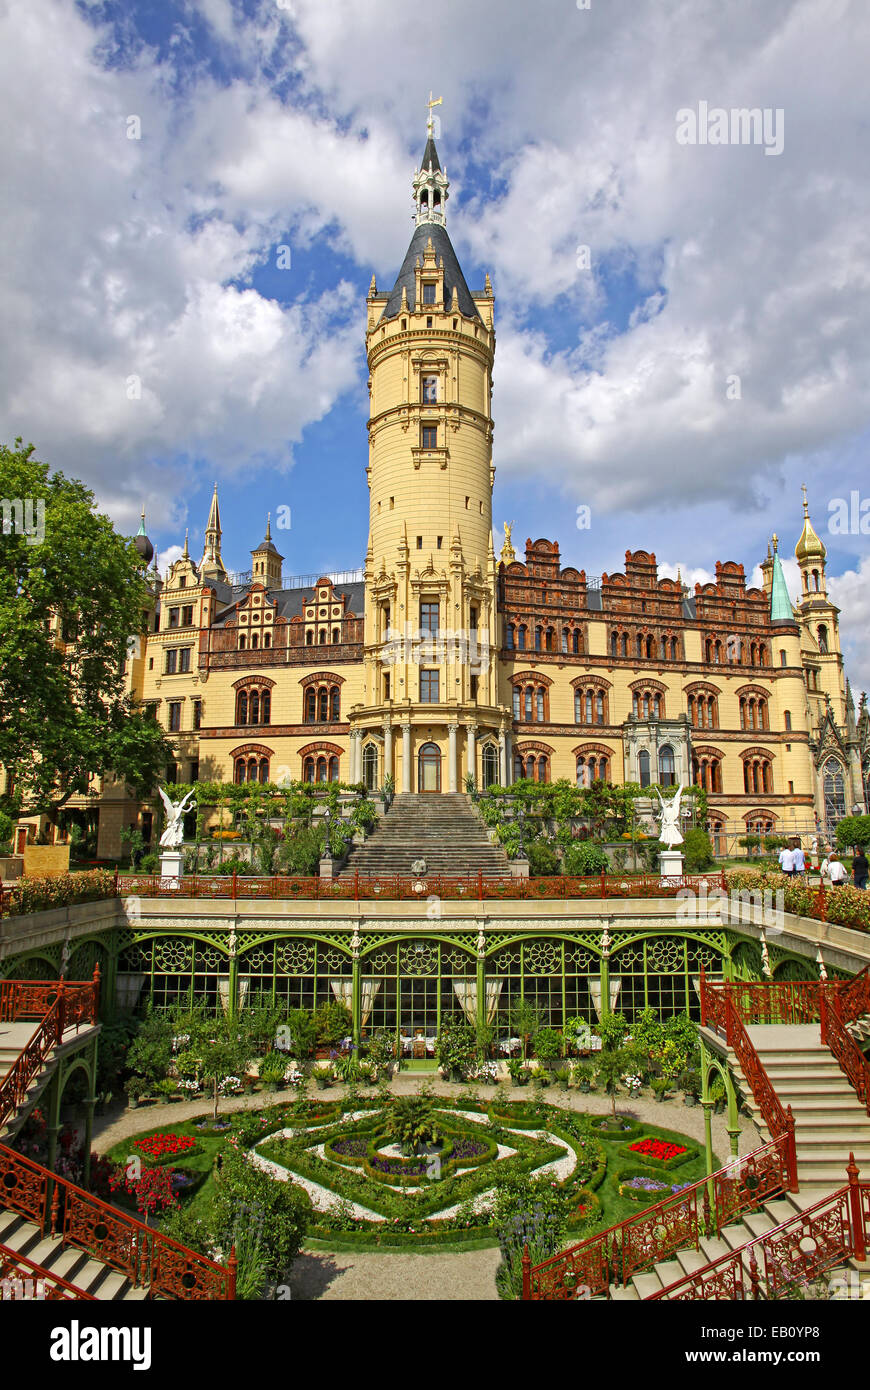 SCHWERIN CASTLE - SCHWERIN, MECKLENBURG - GERMANY - | Dream Homes ...